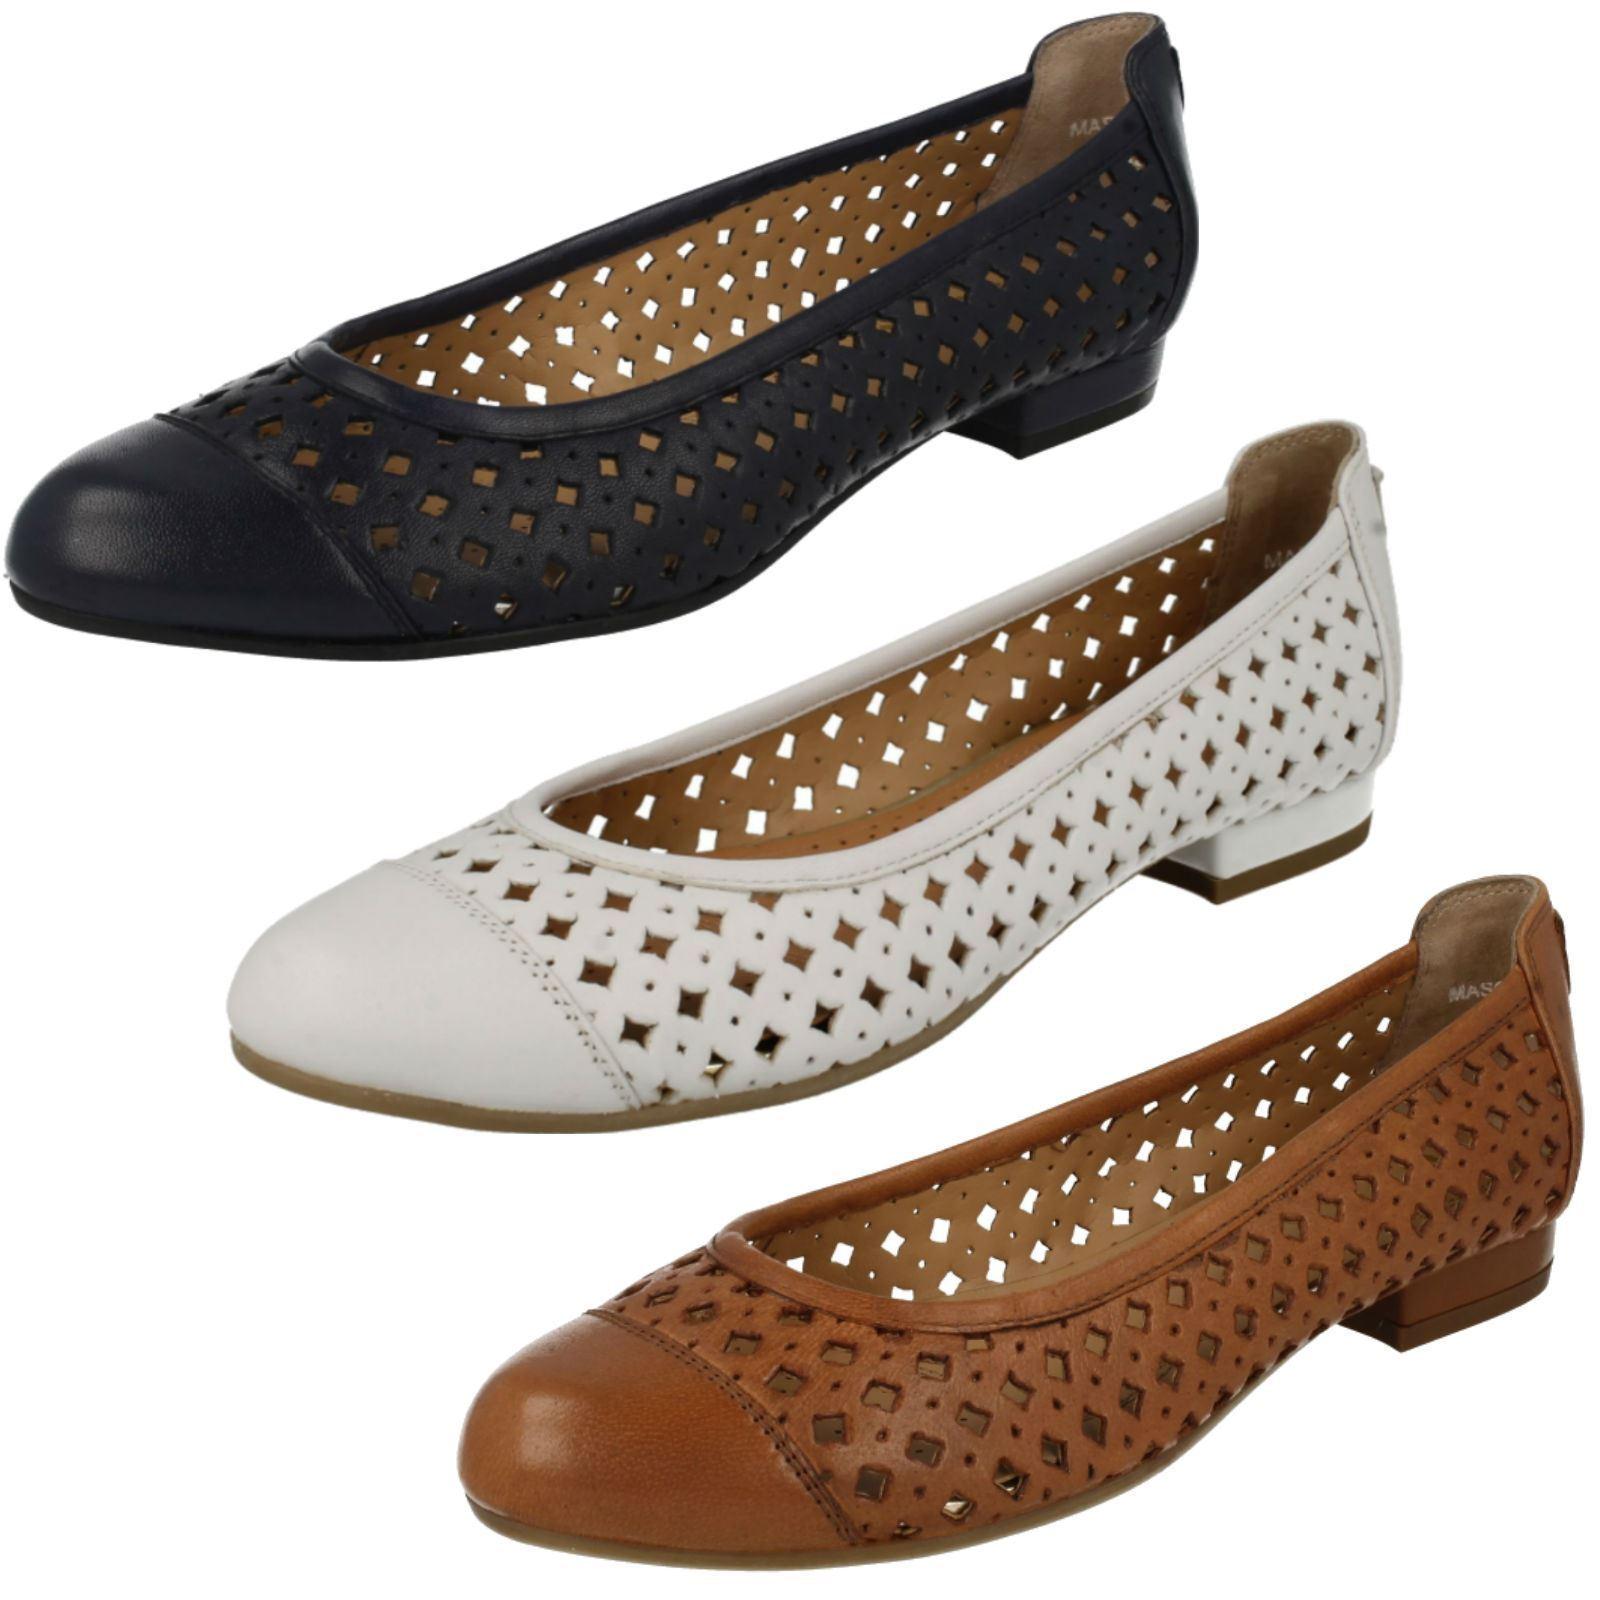 Femmes Van Dal Plat Ballerine Style chaussures  Mason